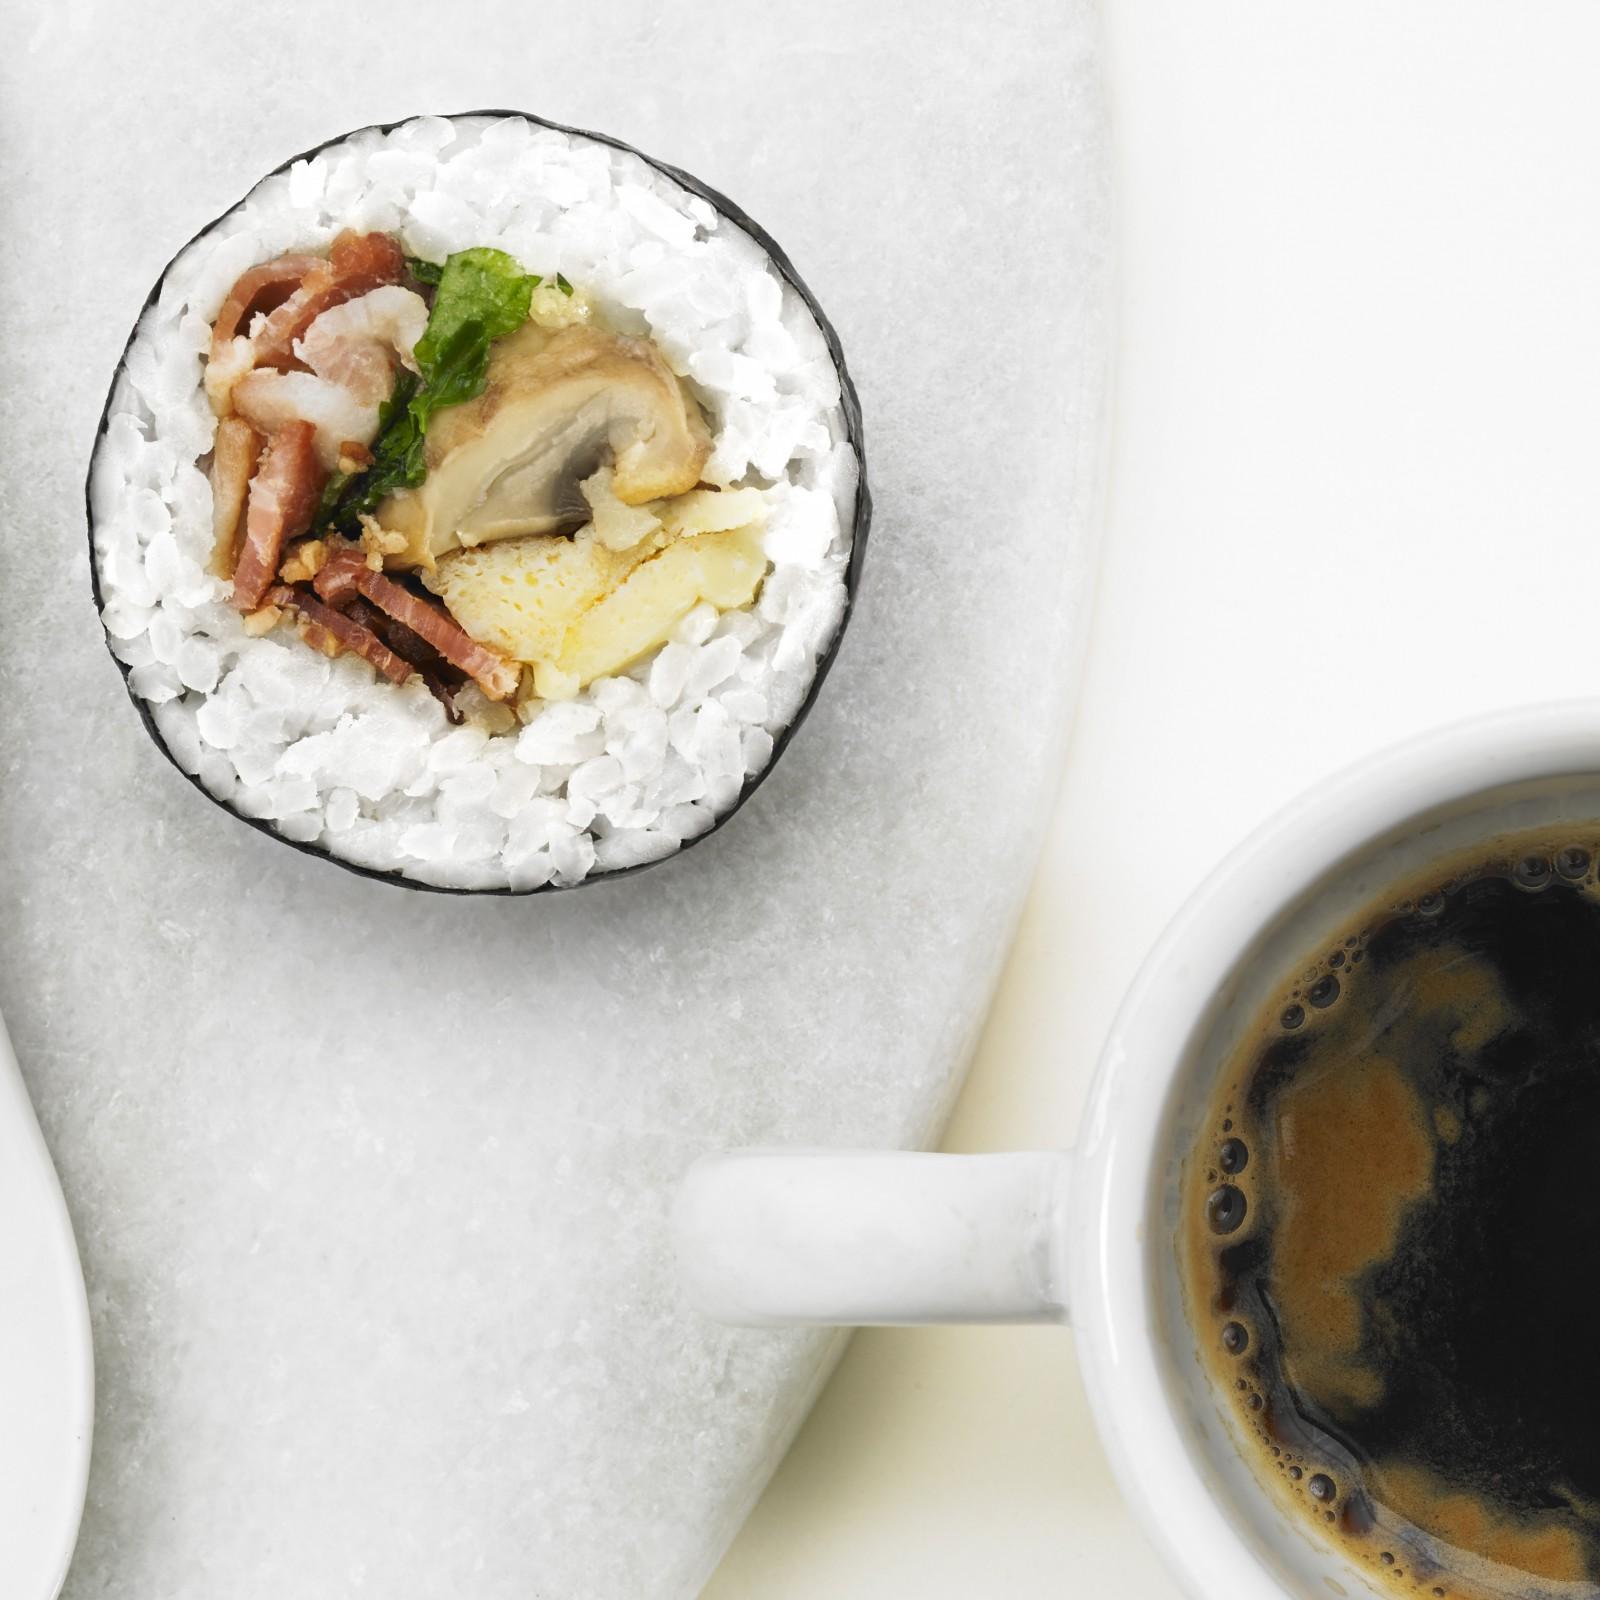 Frukost-prio_46432-1600x1600.jpg